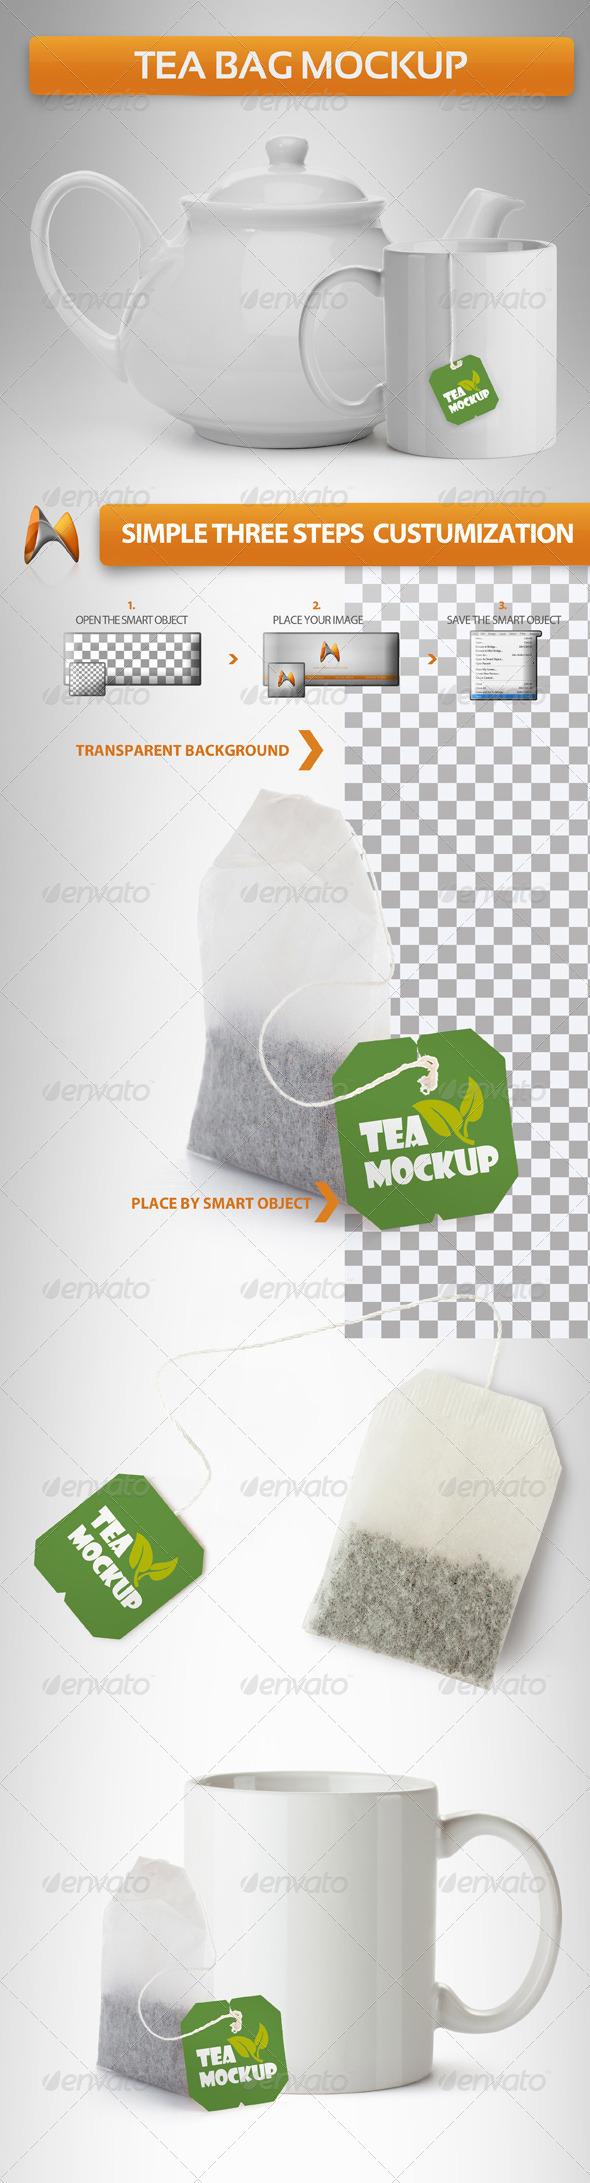 GraphicRiver Tea Bag Mockup 4061675